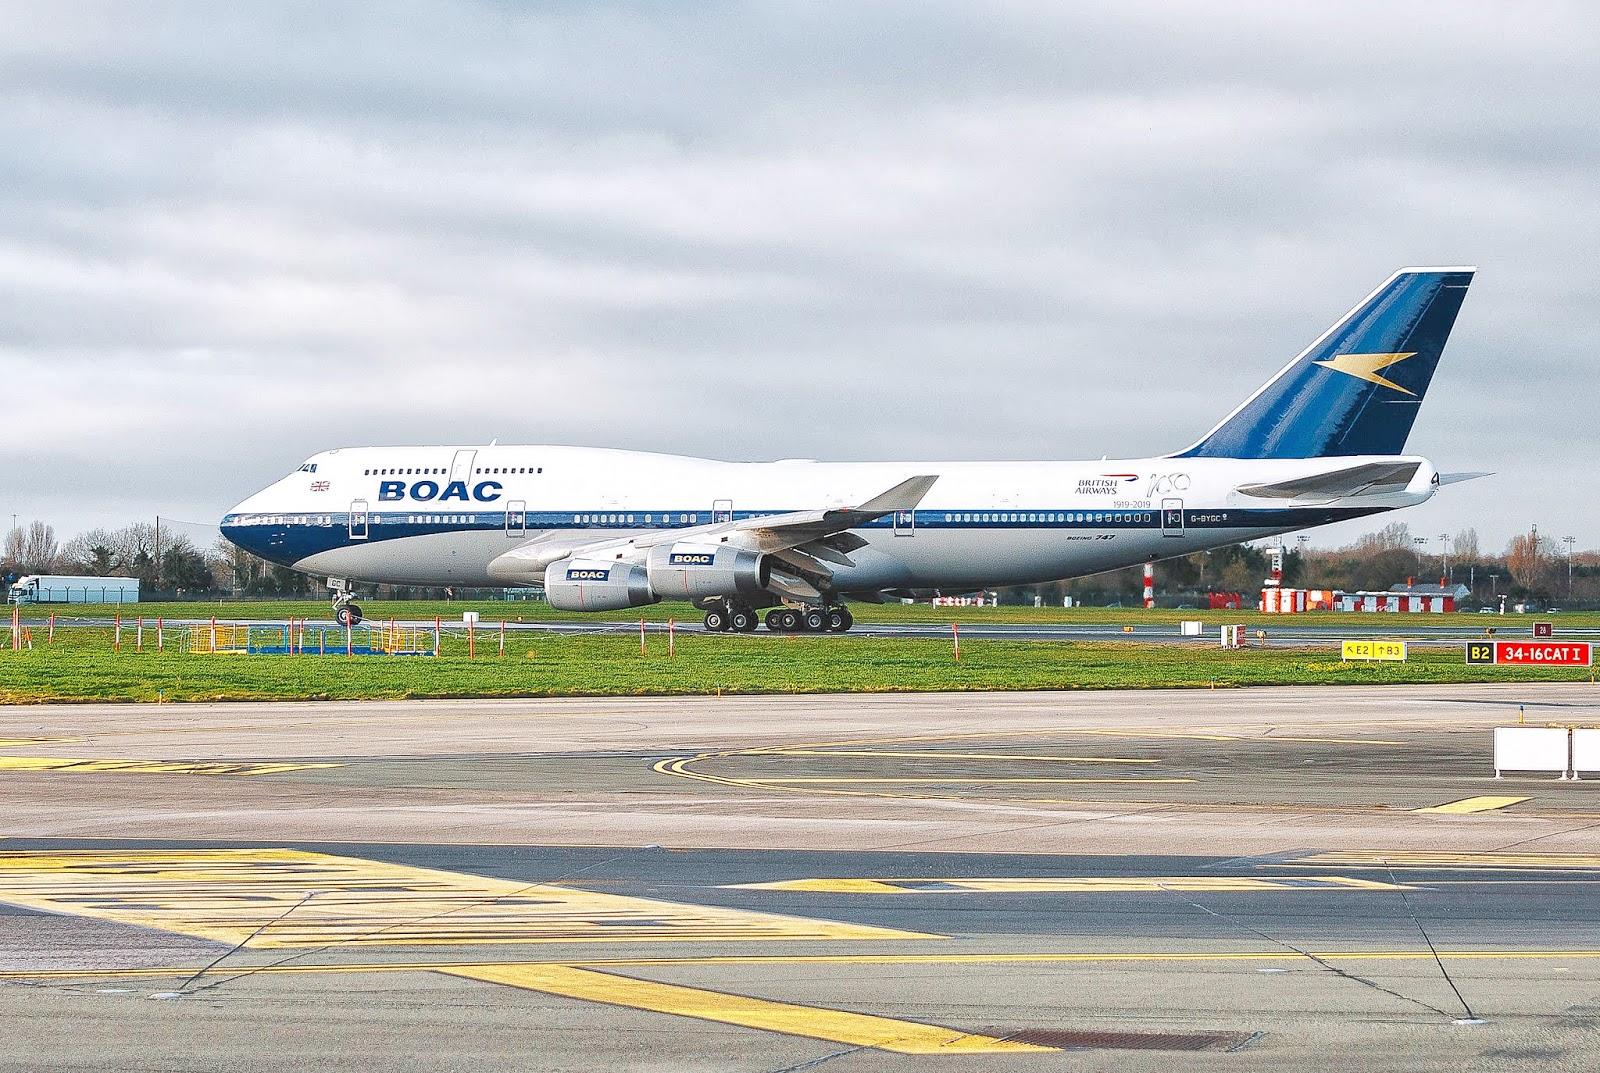 Aos 100 anos British Airways pinta o Boeing 747-400 registro G-BYCG nas cores da BOAC de 1964 | É MAIS QUE VOAR